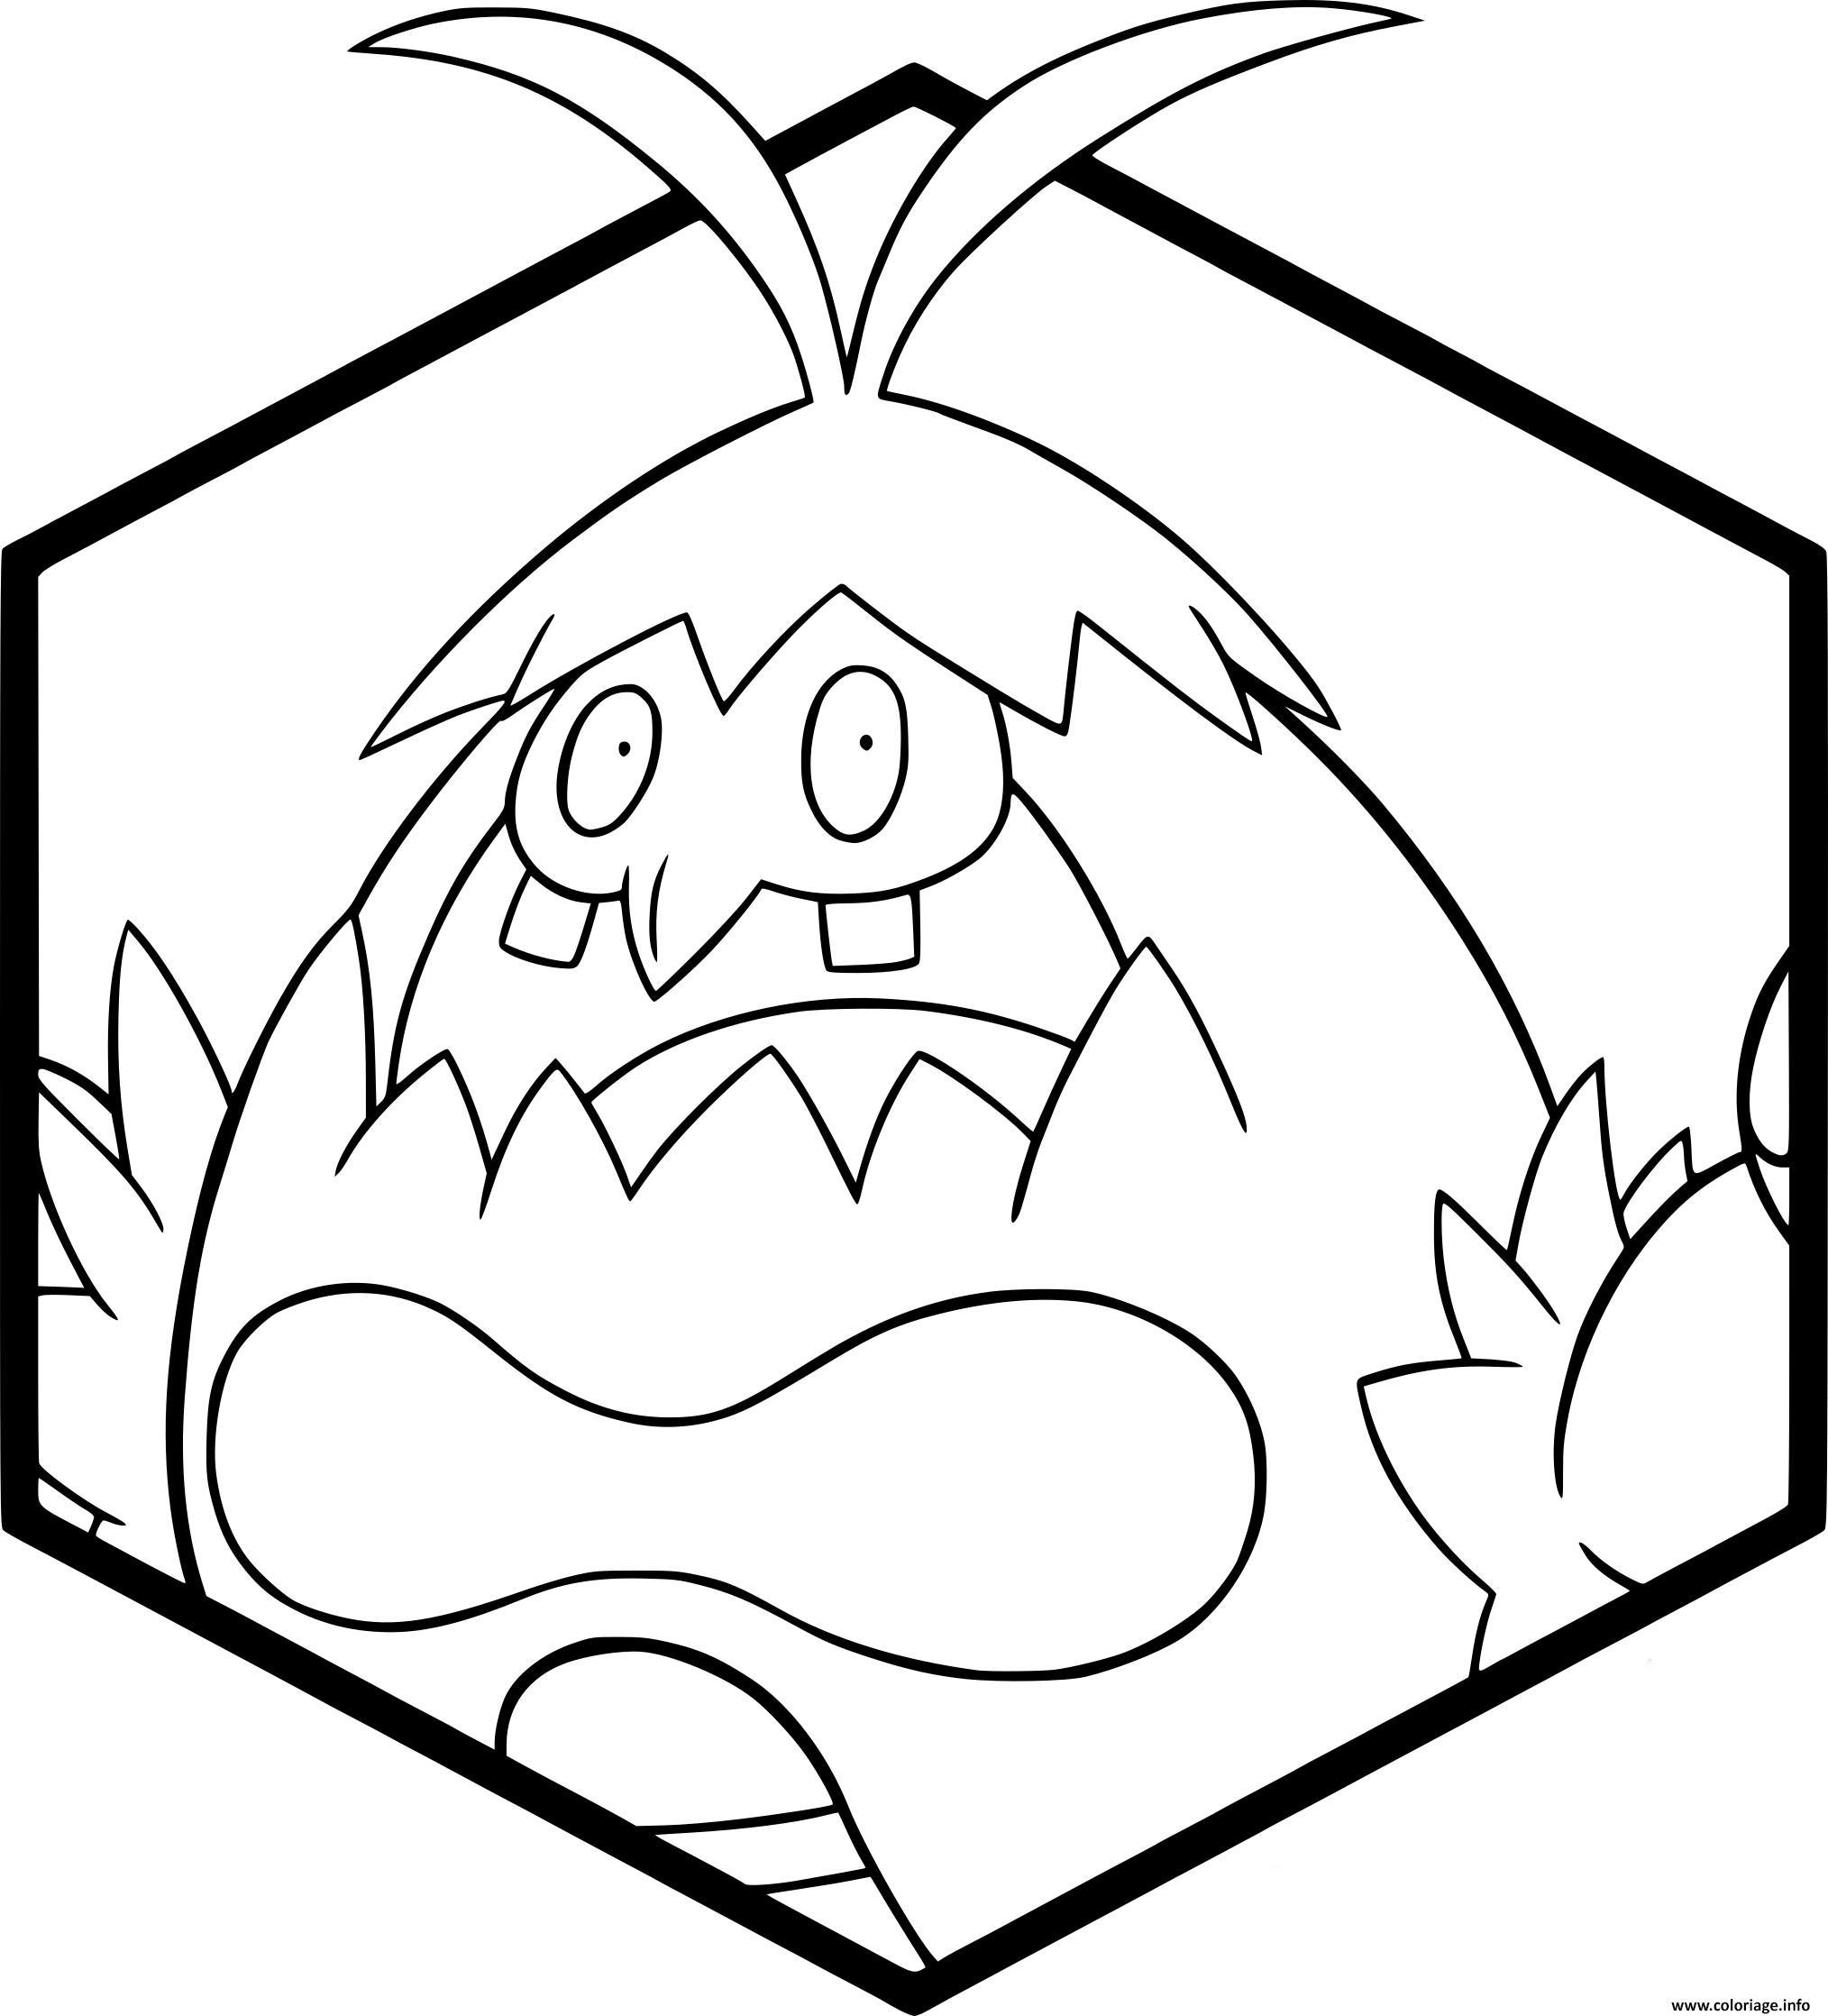 Coloriage pokemon xy crabominable dessin - Coloriage info ...